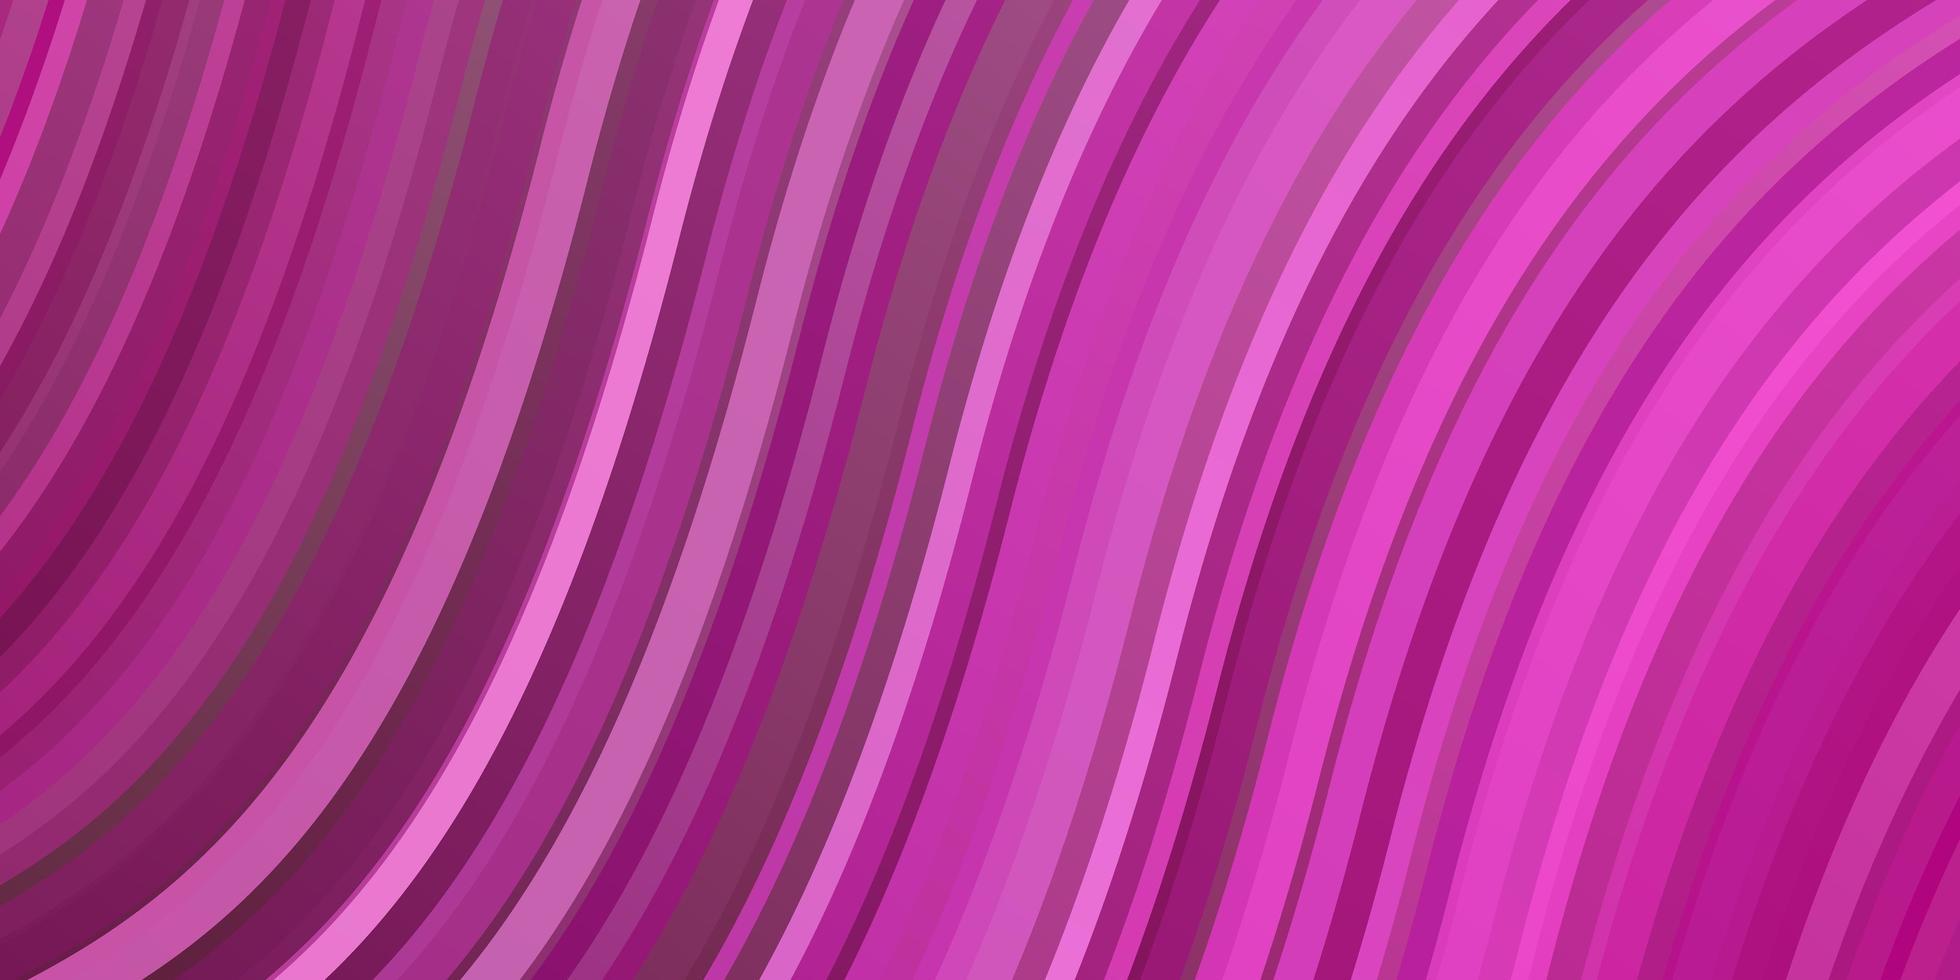 fundo vector rosa claro com arcos.